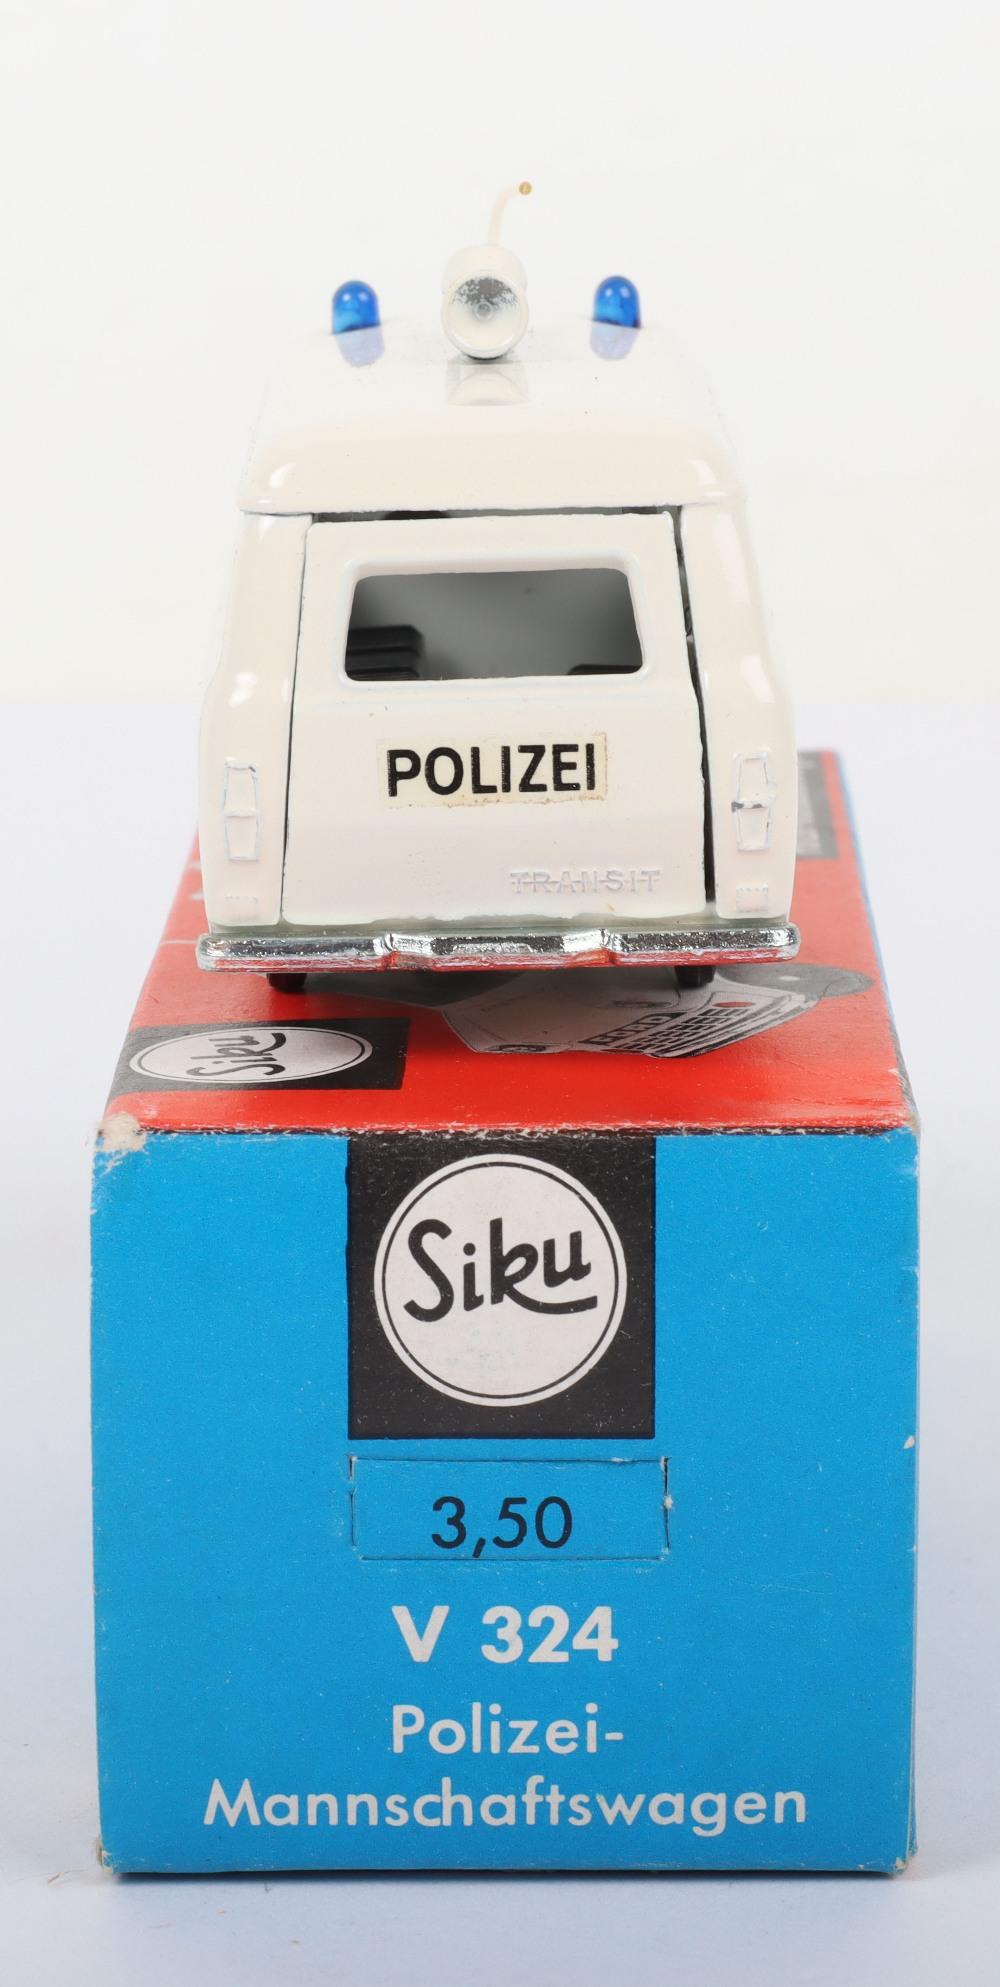 Siku (Germany) V 324 Ford Transit Polizei Van - Image 3 of 5